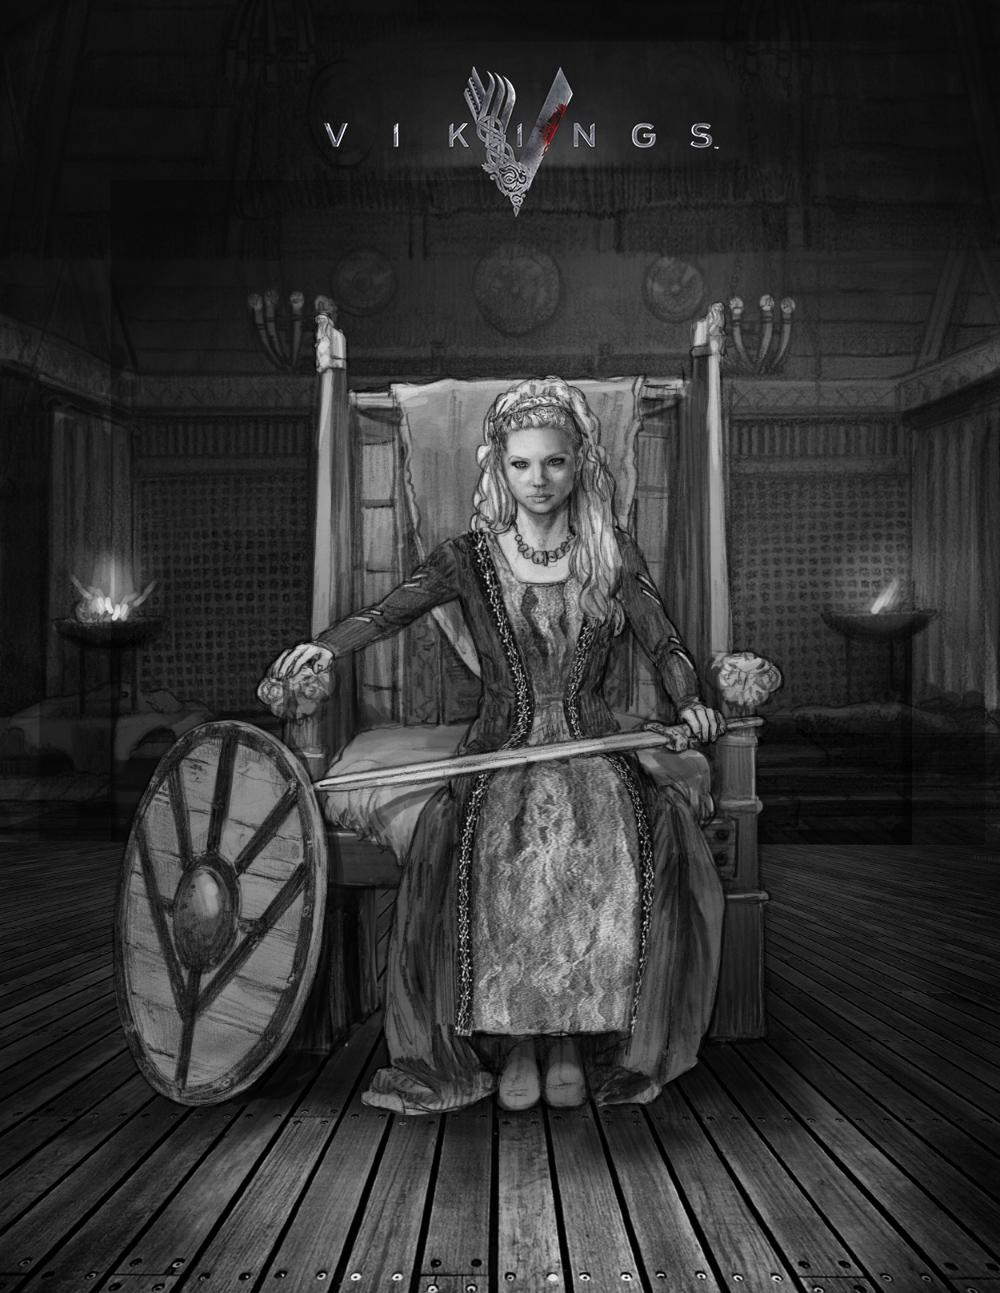 throne_comp_new+lagertha+3.jpg